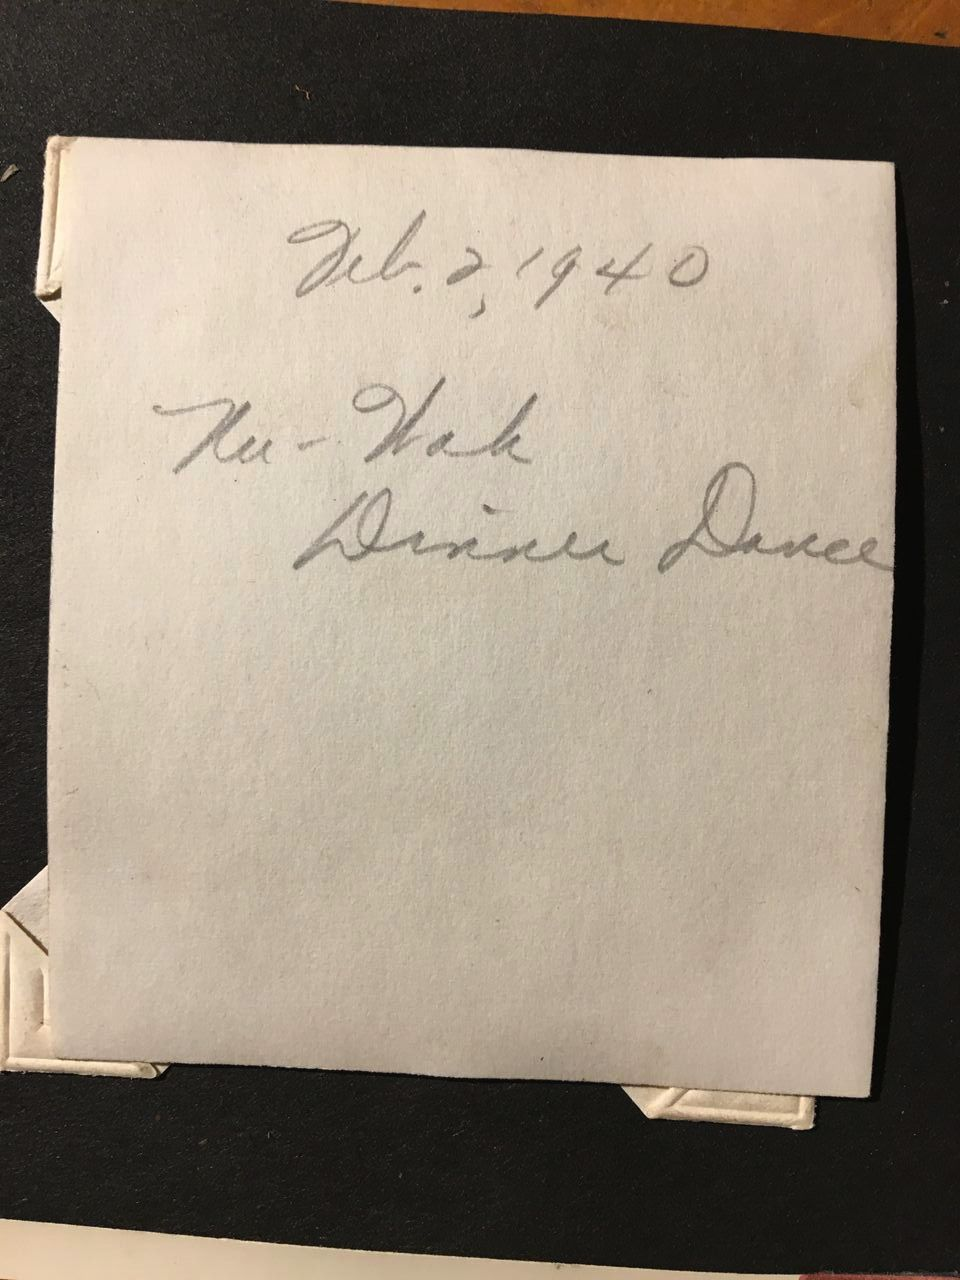 feb 2 1940 heart 1 b